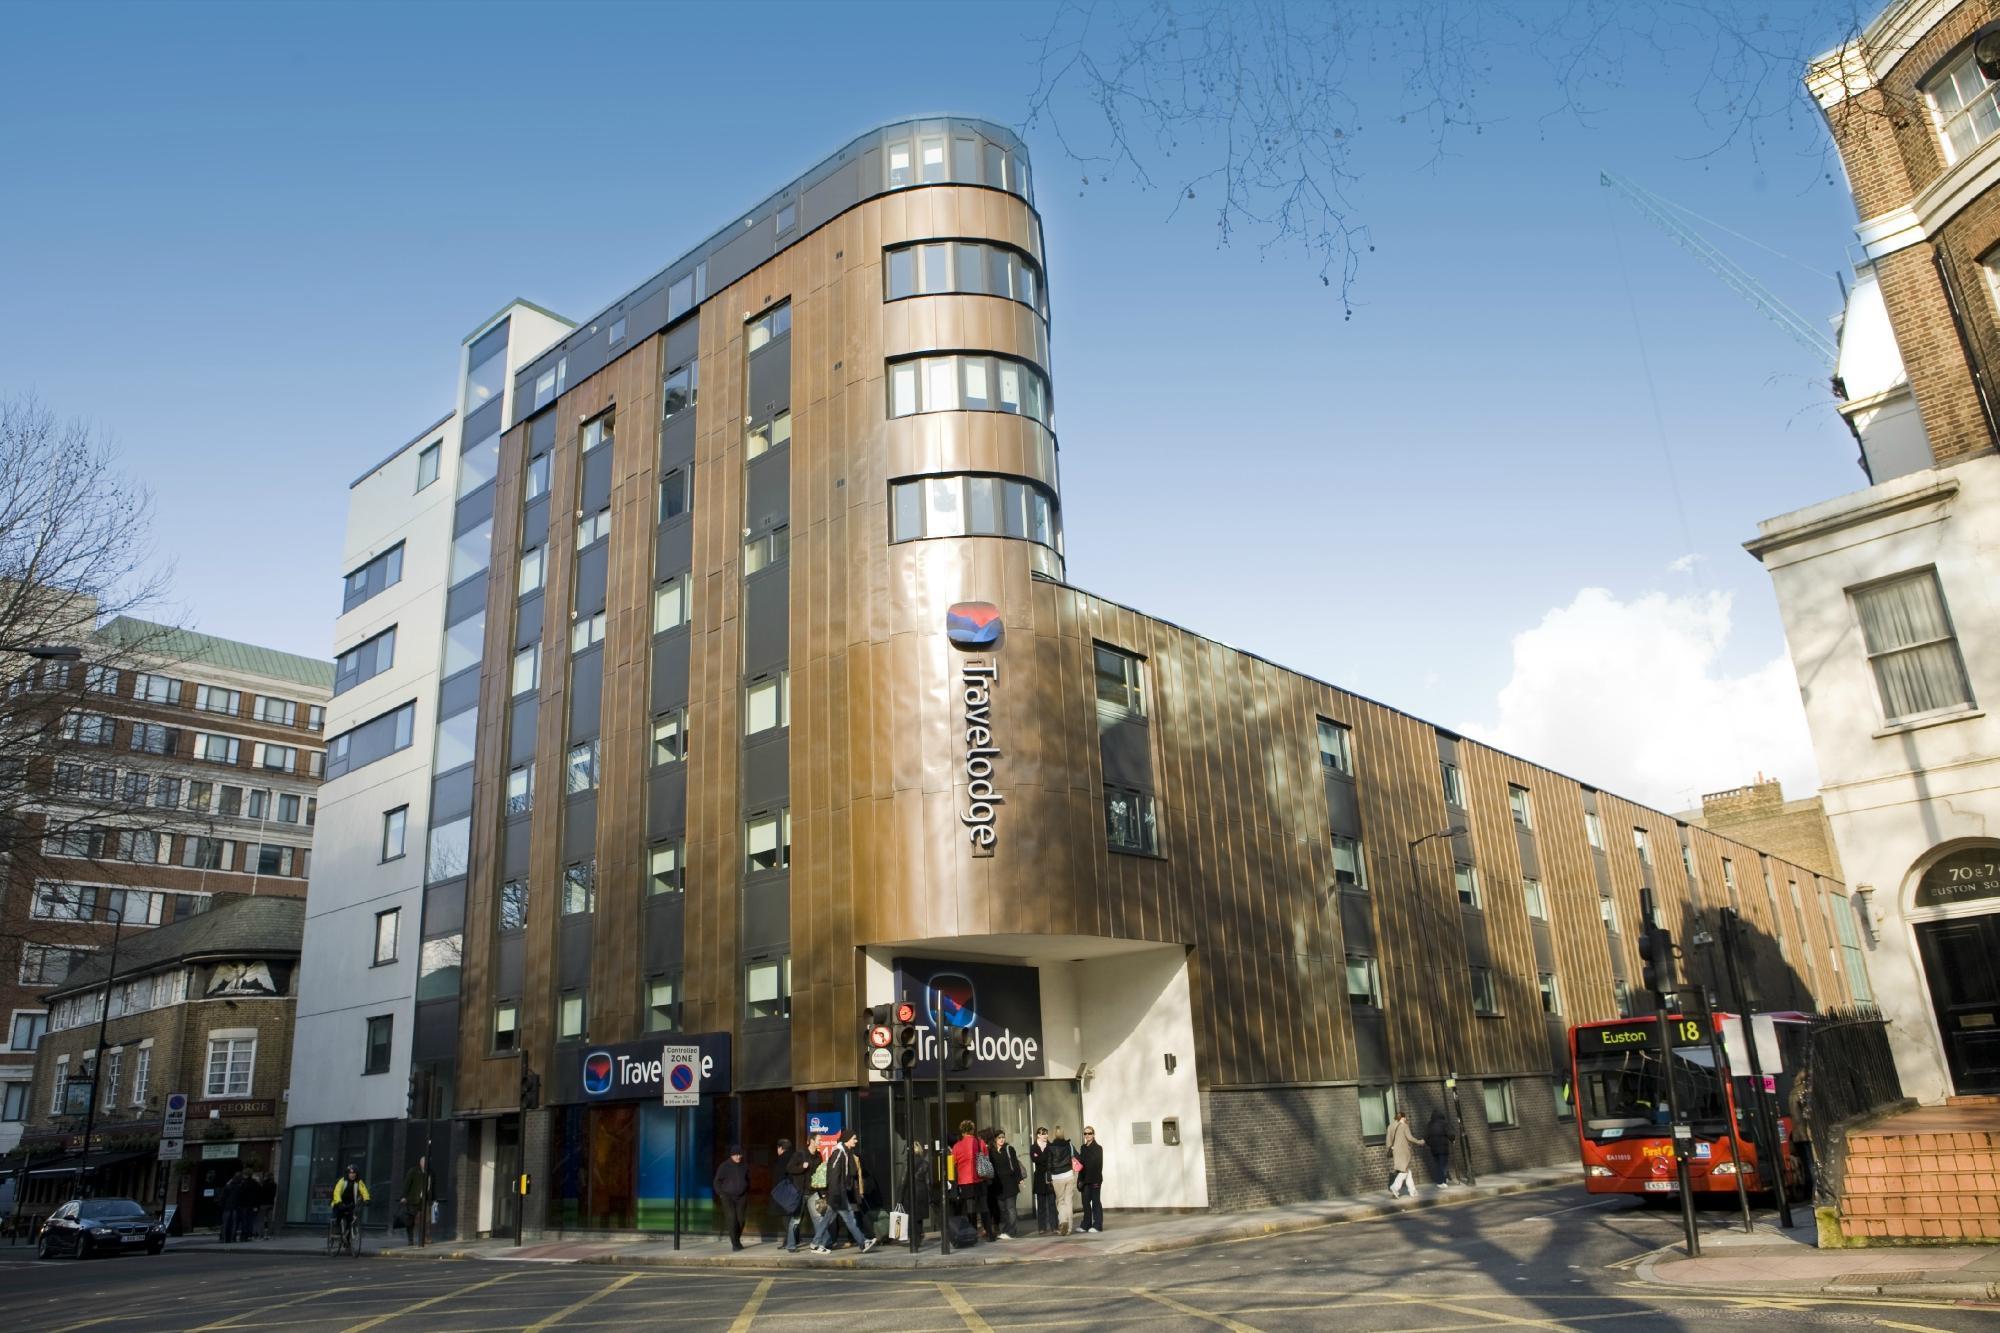 Travelodge London Central Euston